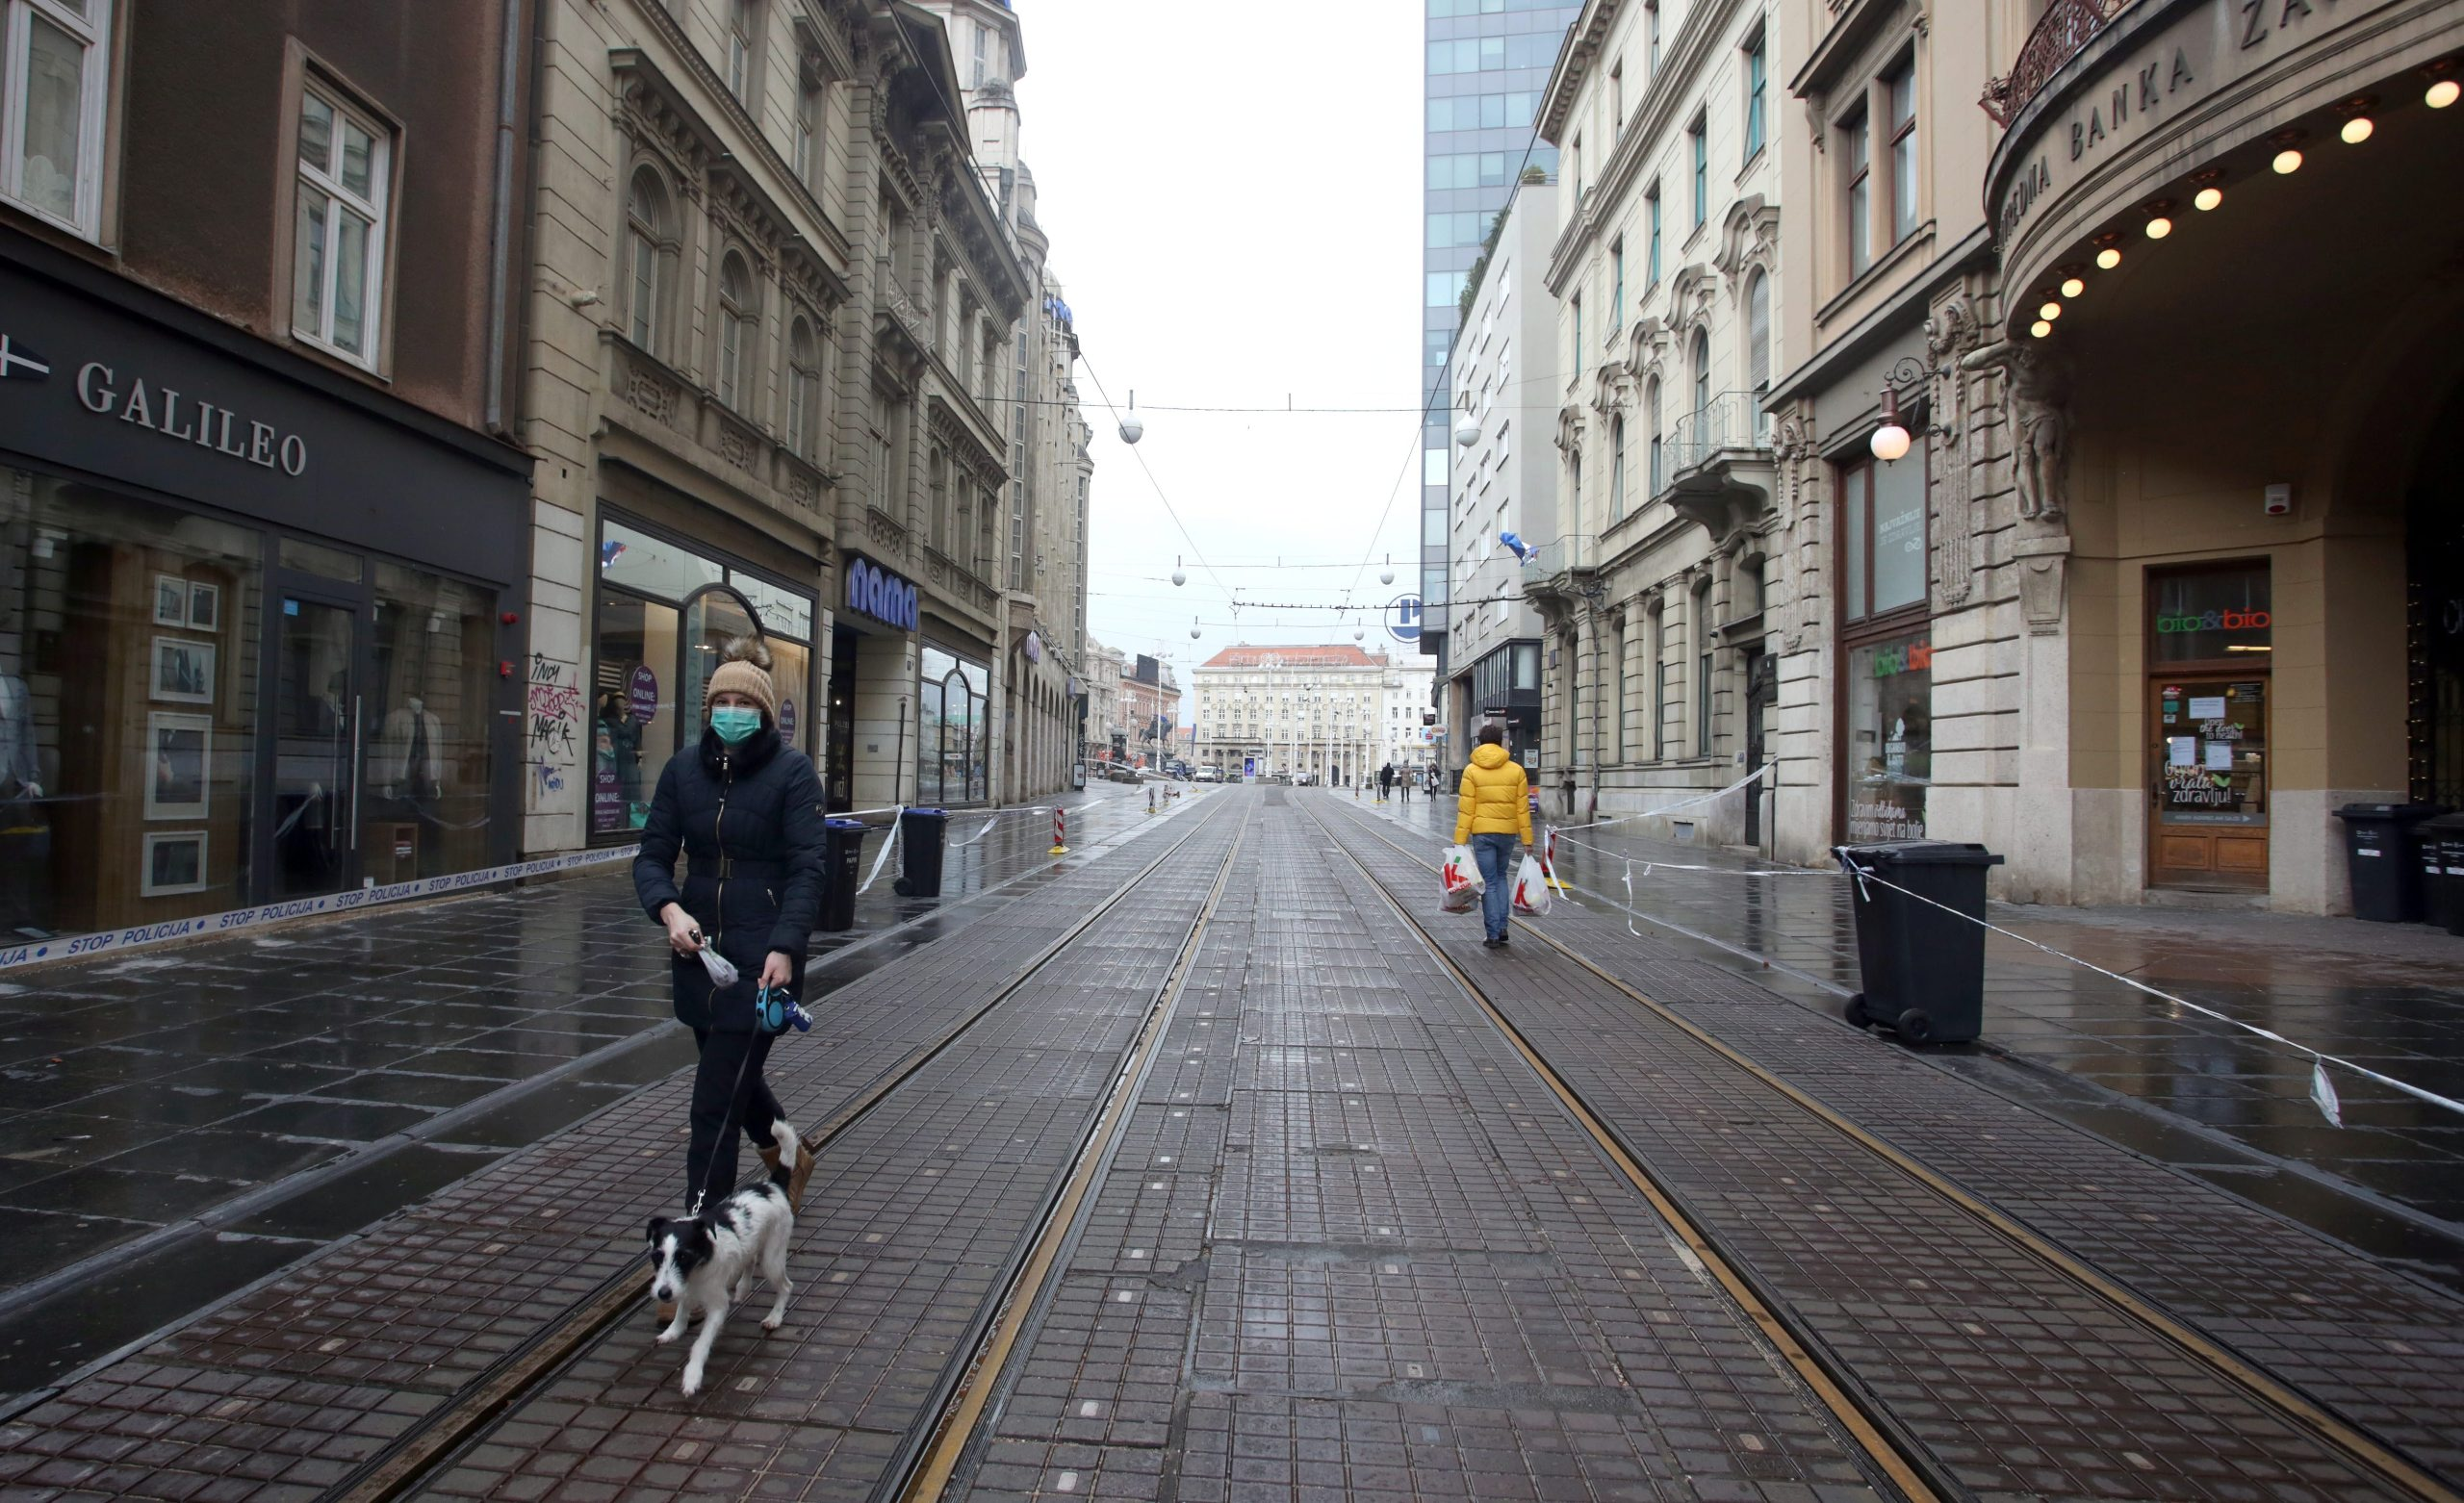 centar_ulice8-250320